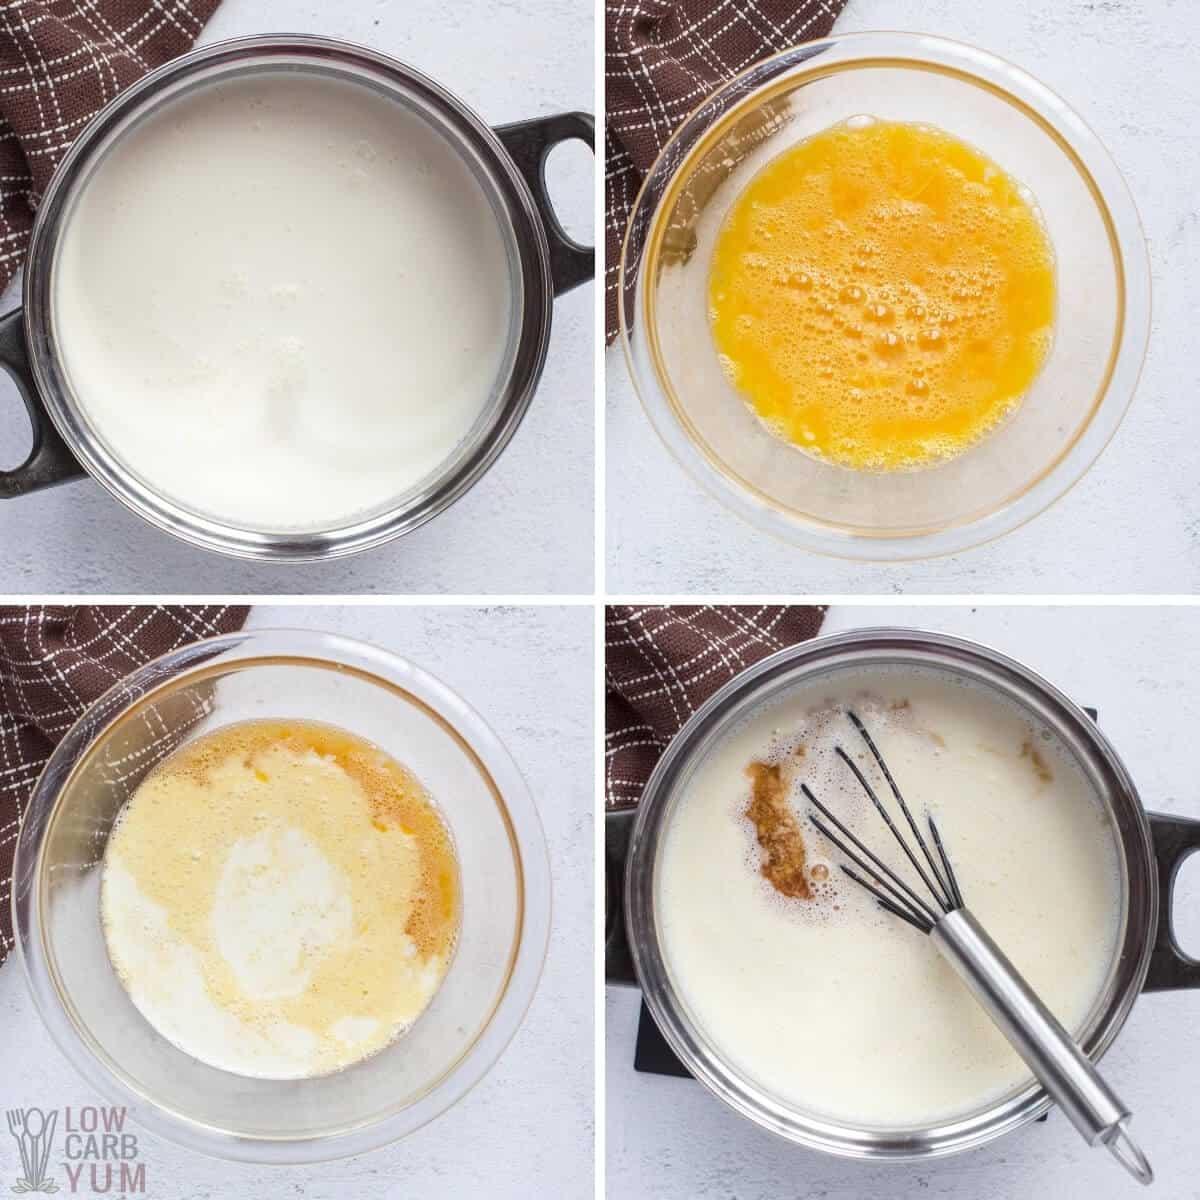 preparing the custard